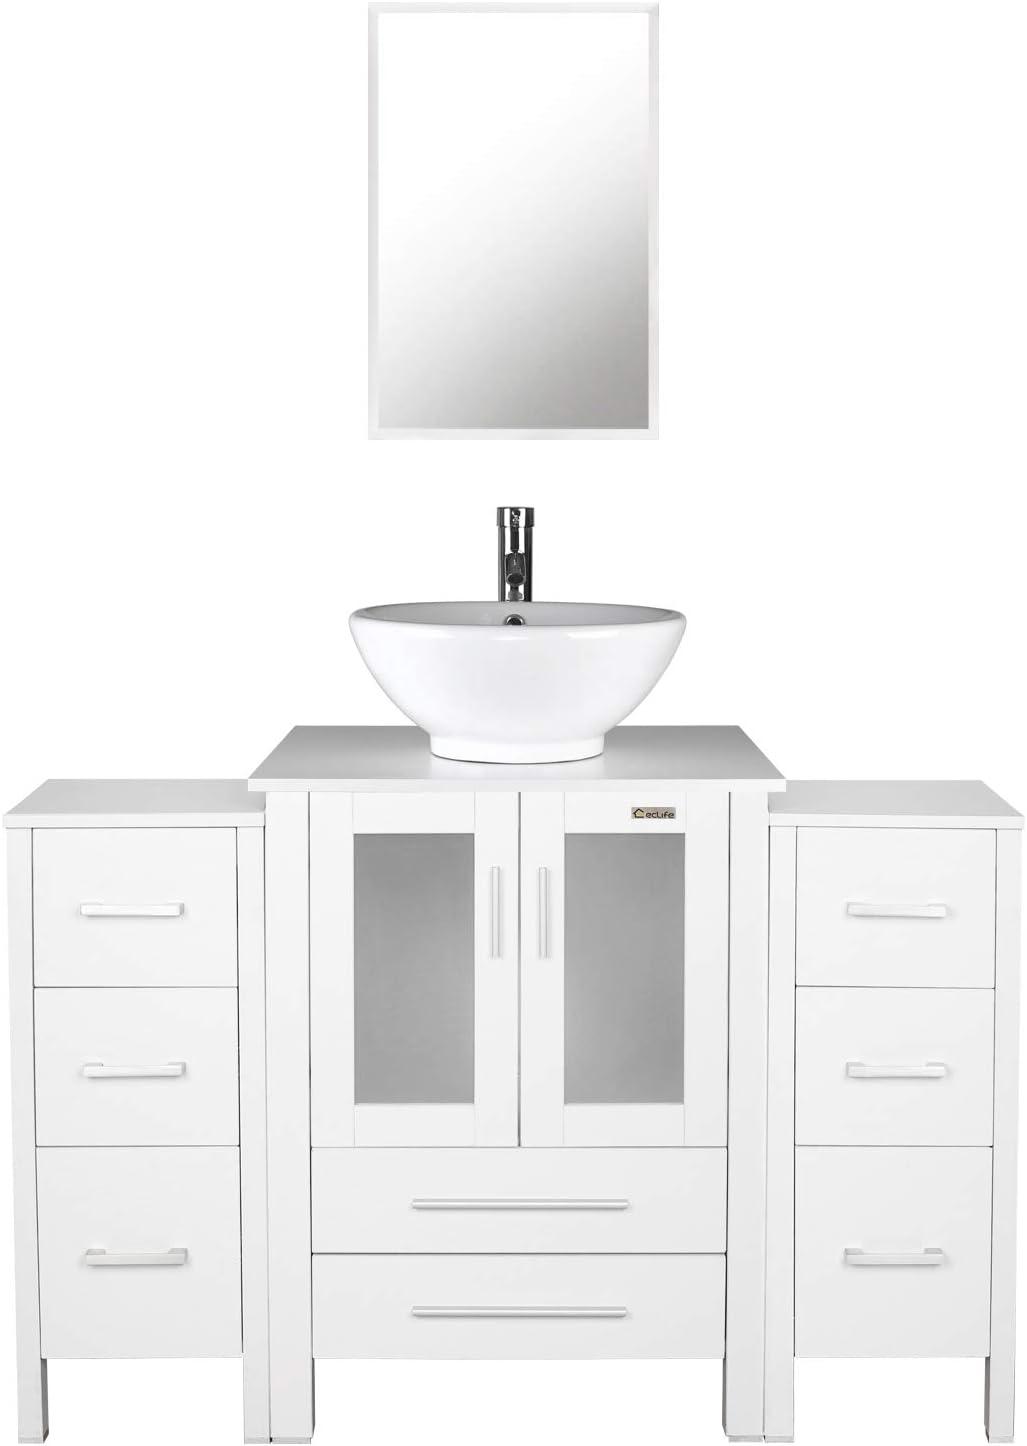 28 Inch Bathroom Vanity Set Modern MDF Stand Pedestal ...